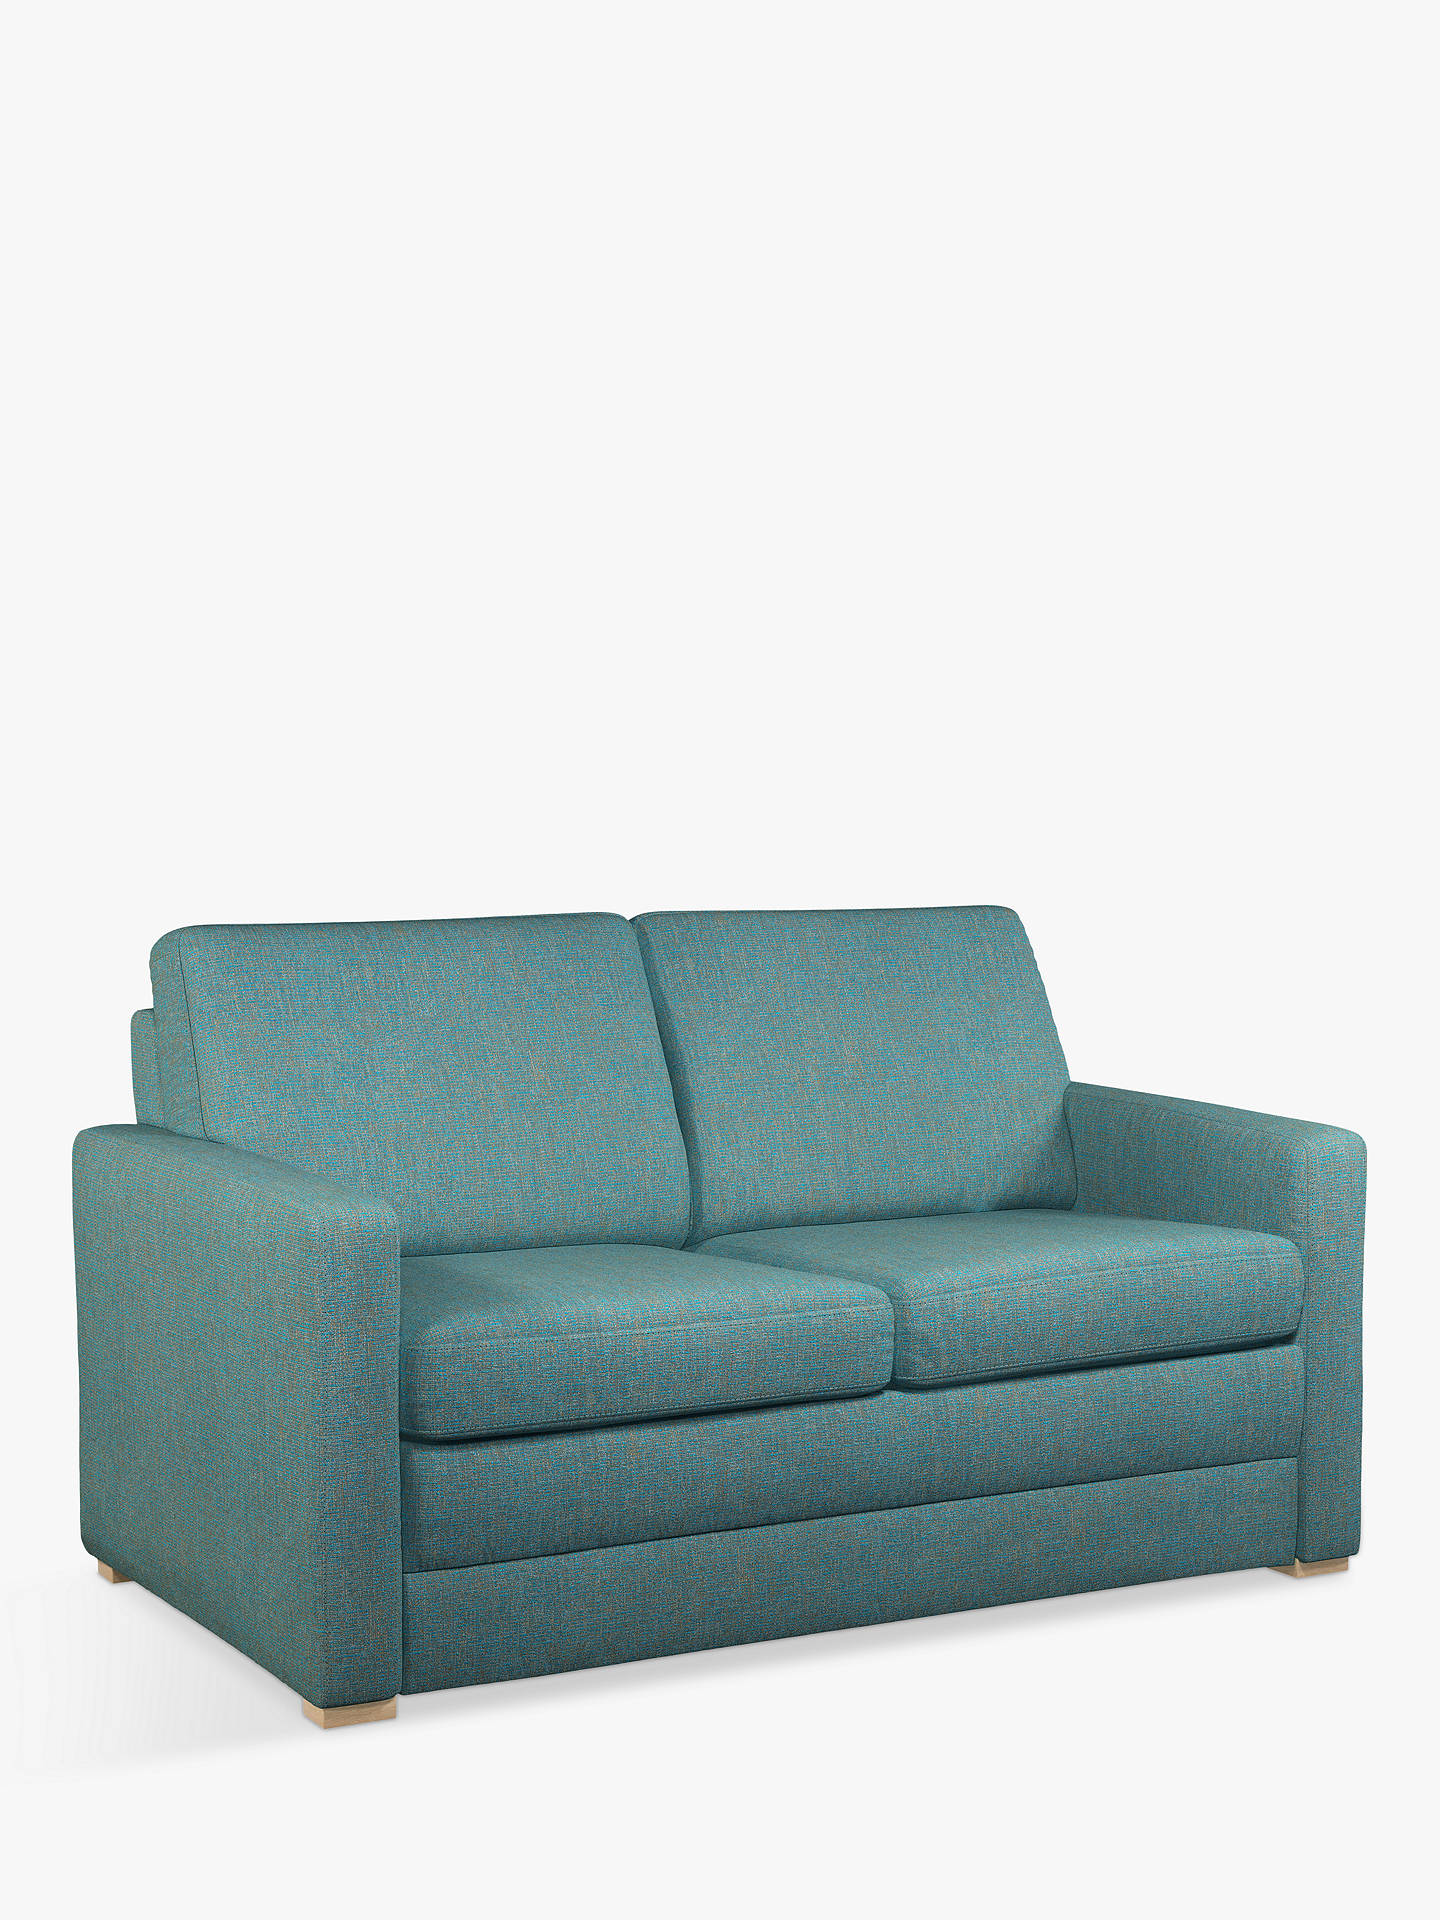 John Lewis Partners Siesta Sofa Bed Light Leg Riley Teal Online At Johnlewis